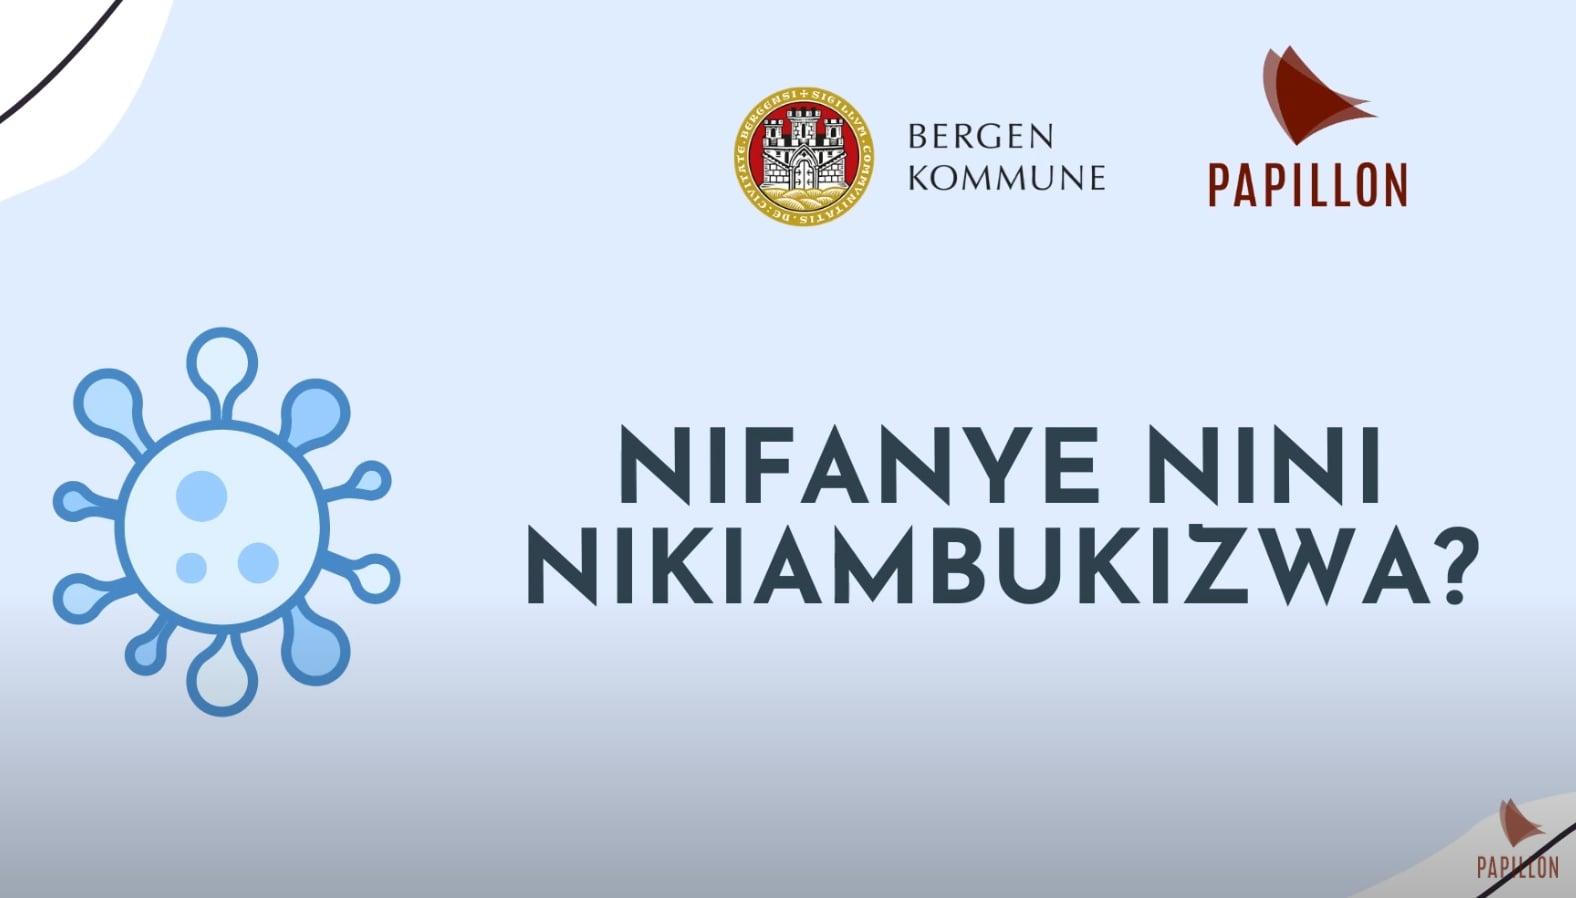 Nifanye nini nikiambukizwa? (Isolasjon og nærkontakter - Swahili)